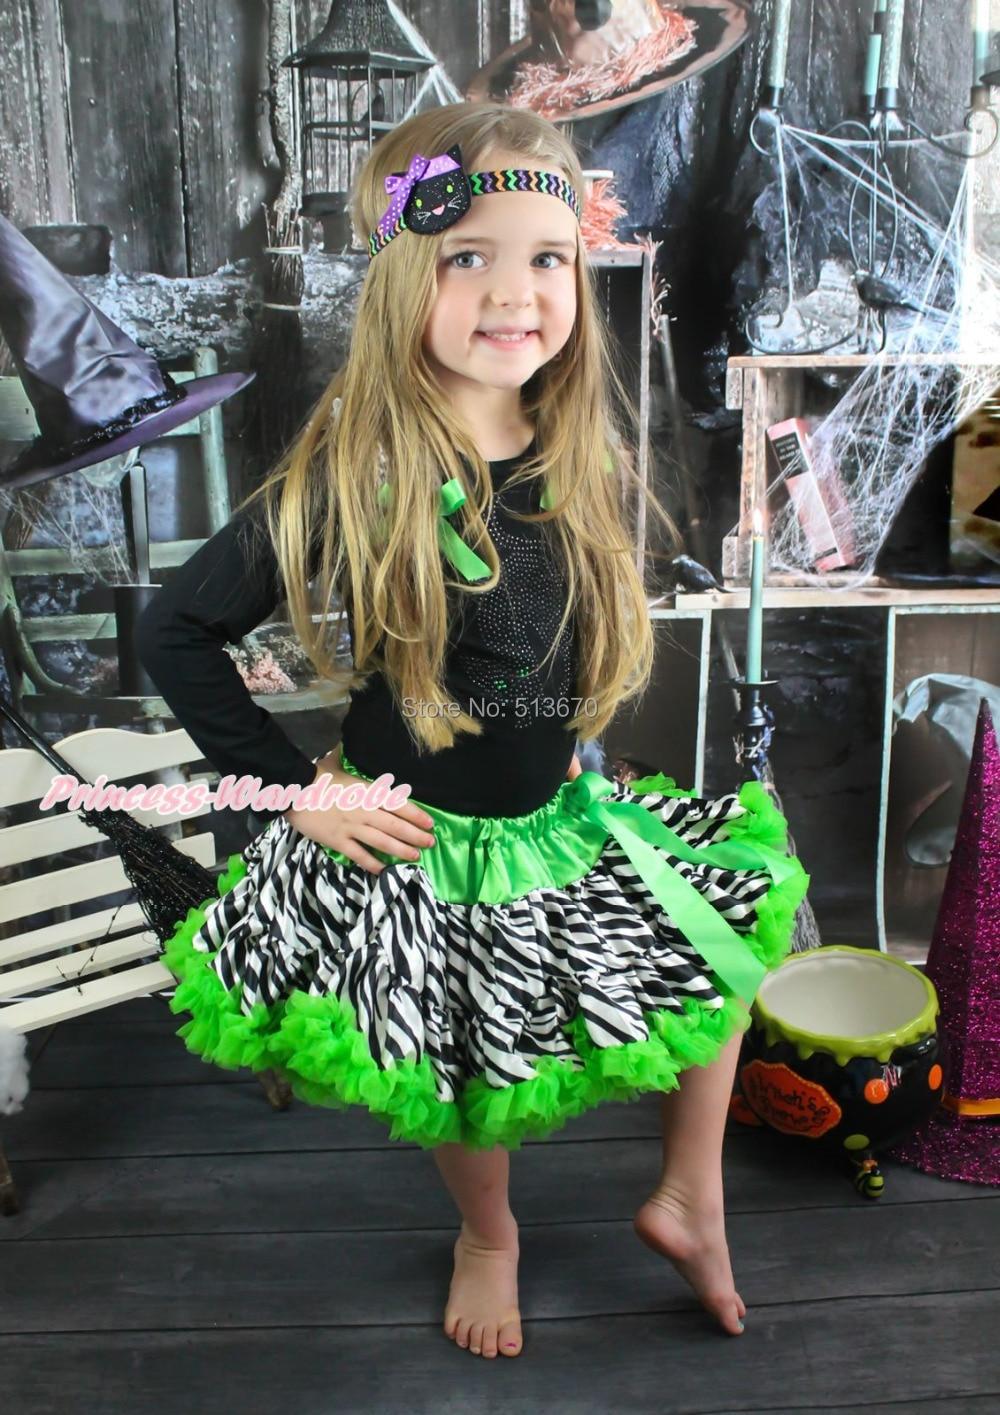 Halloween Rhinestone Cat Black Pettitop Girl Green Zebra Pettiskirt Outfit 1-8Y MAMG1226<br>